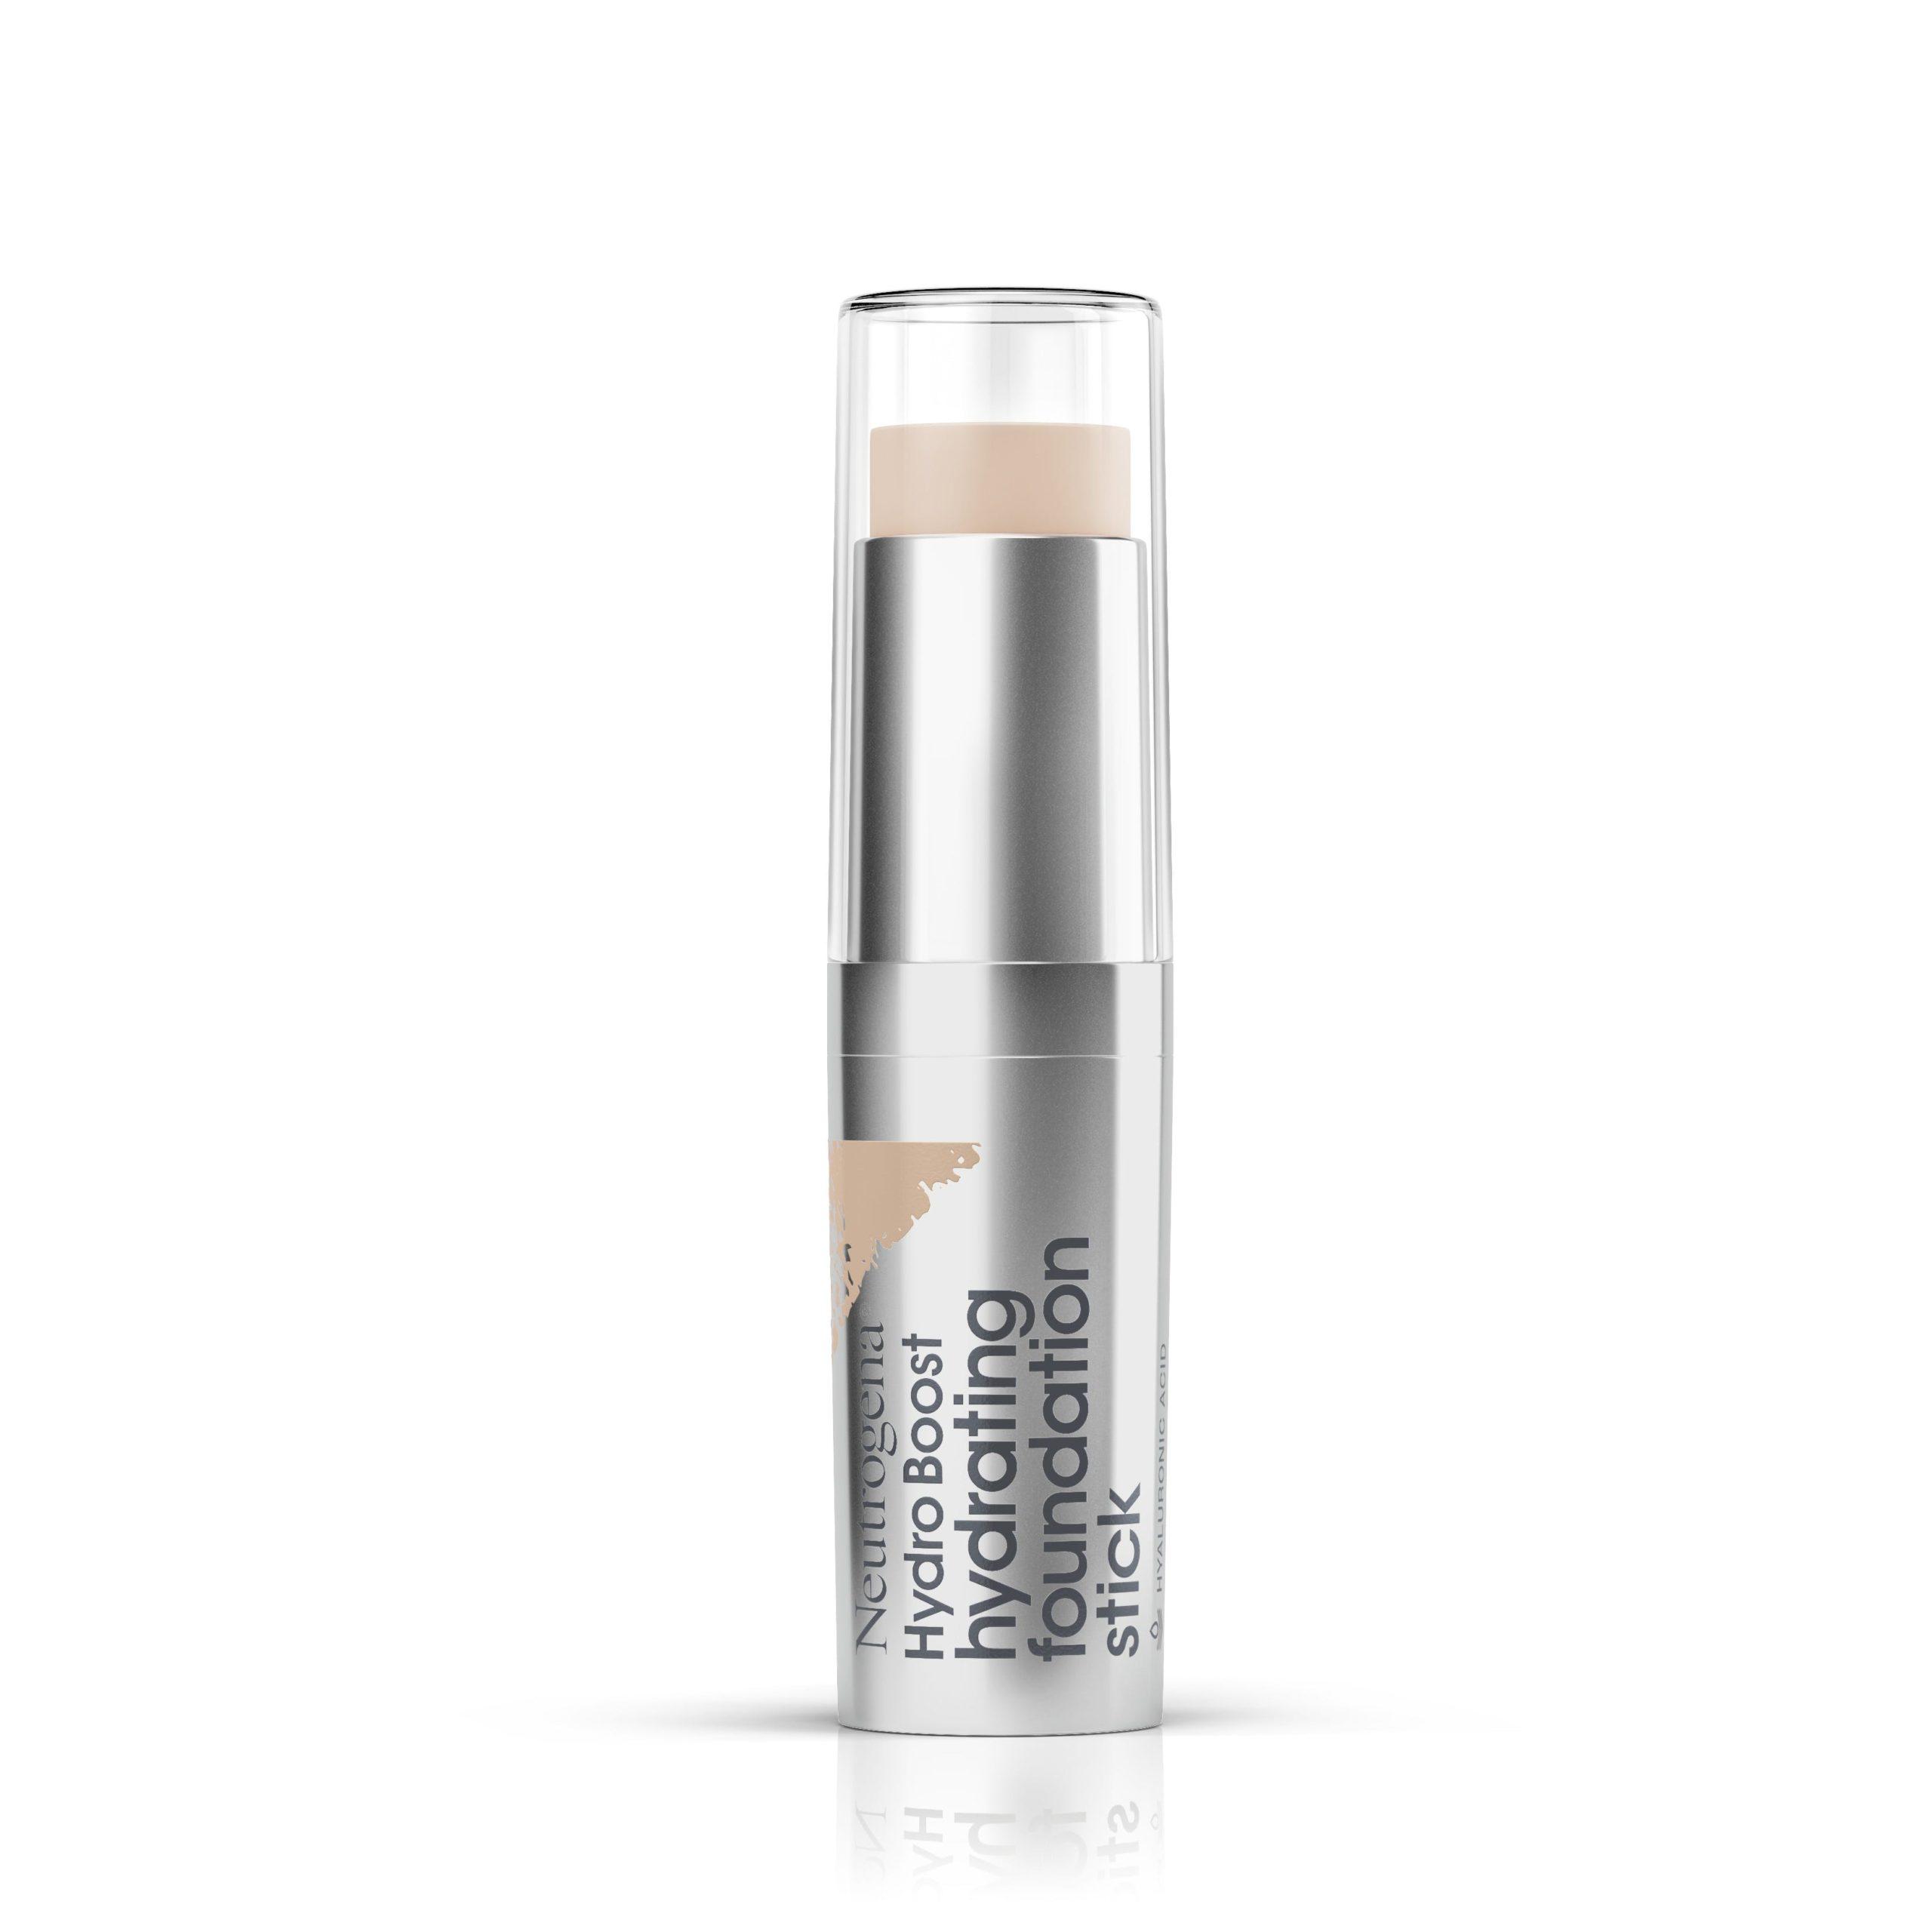 Hydro Boost Hydrating Foundation Stick - Classic Ivory